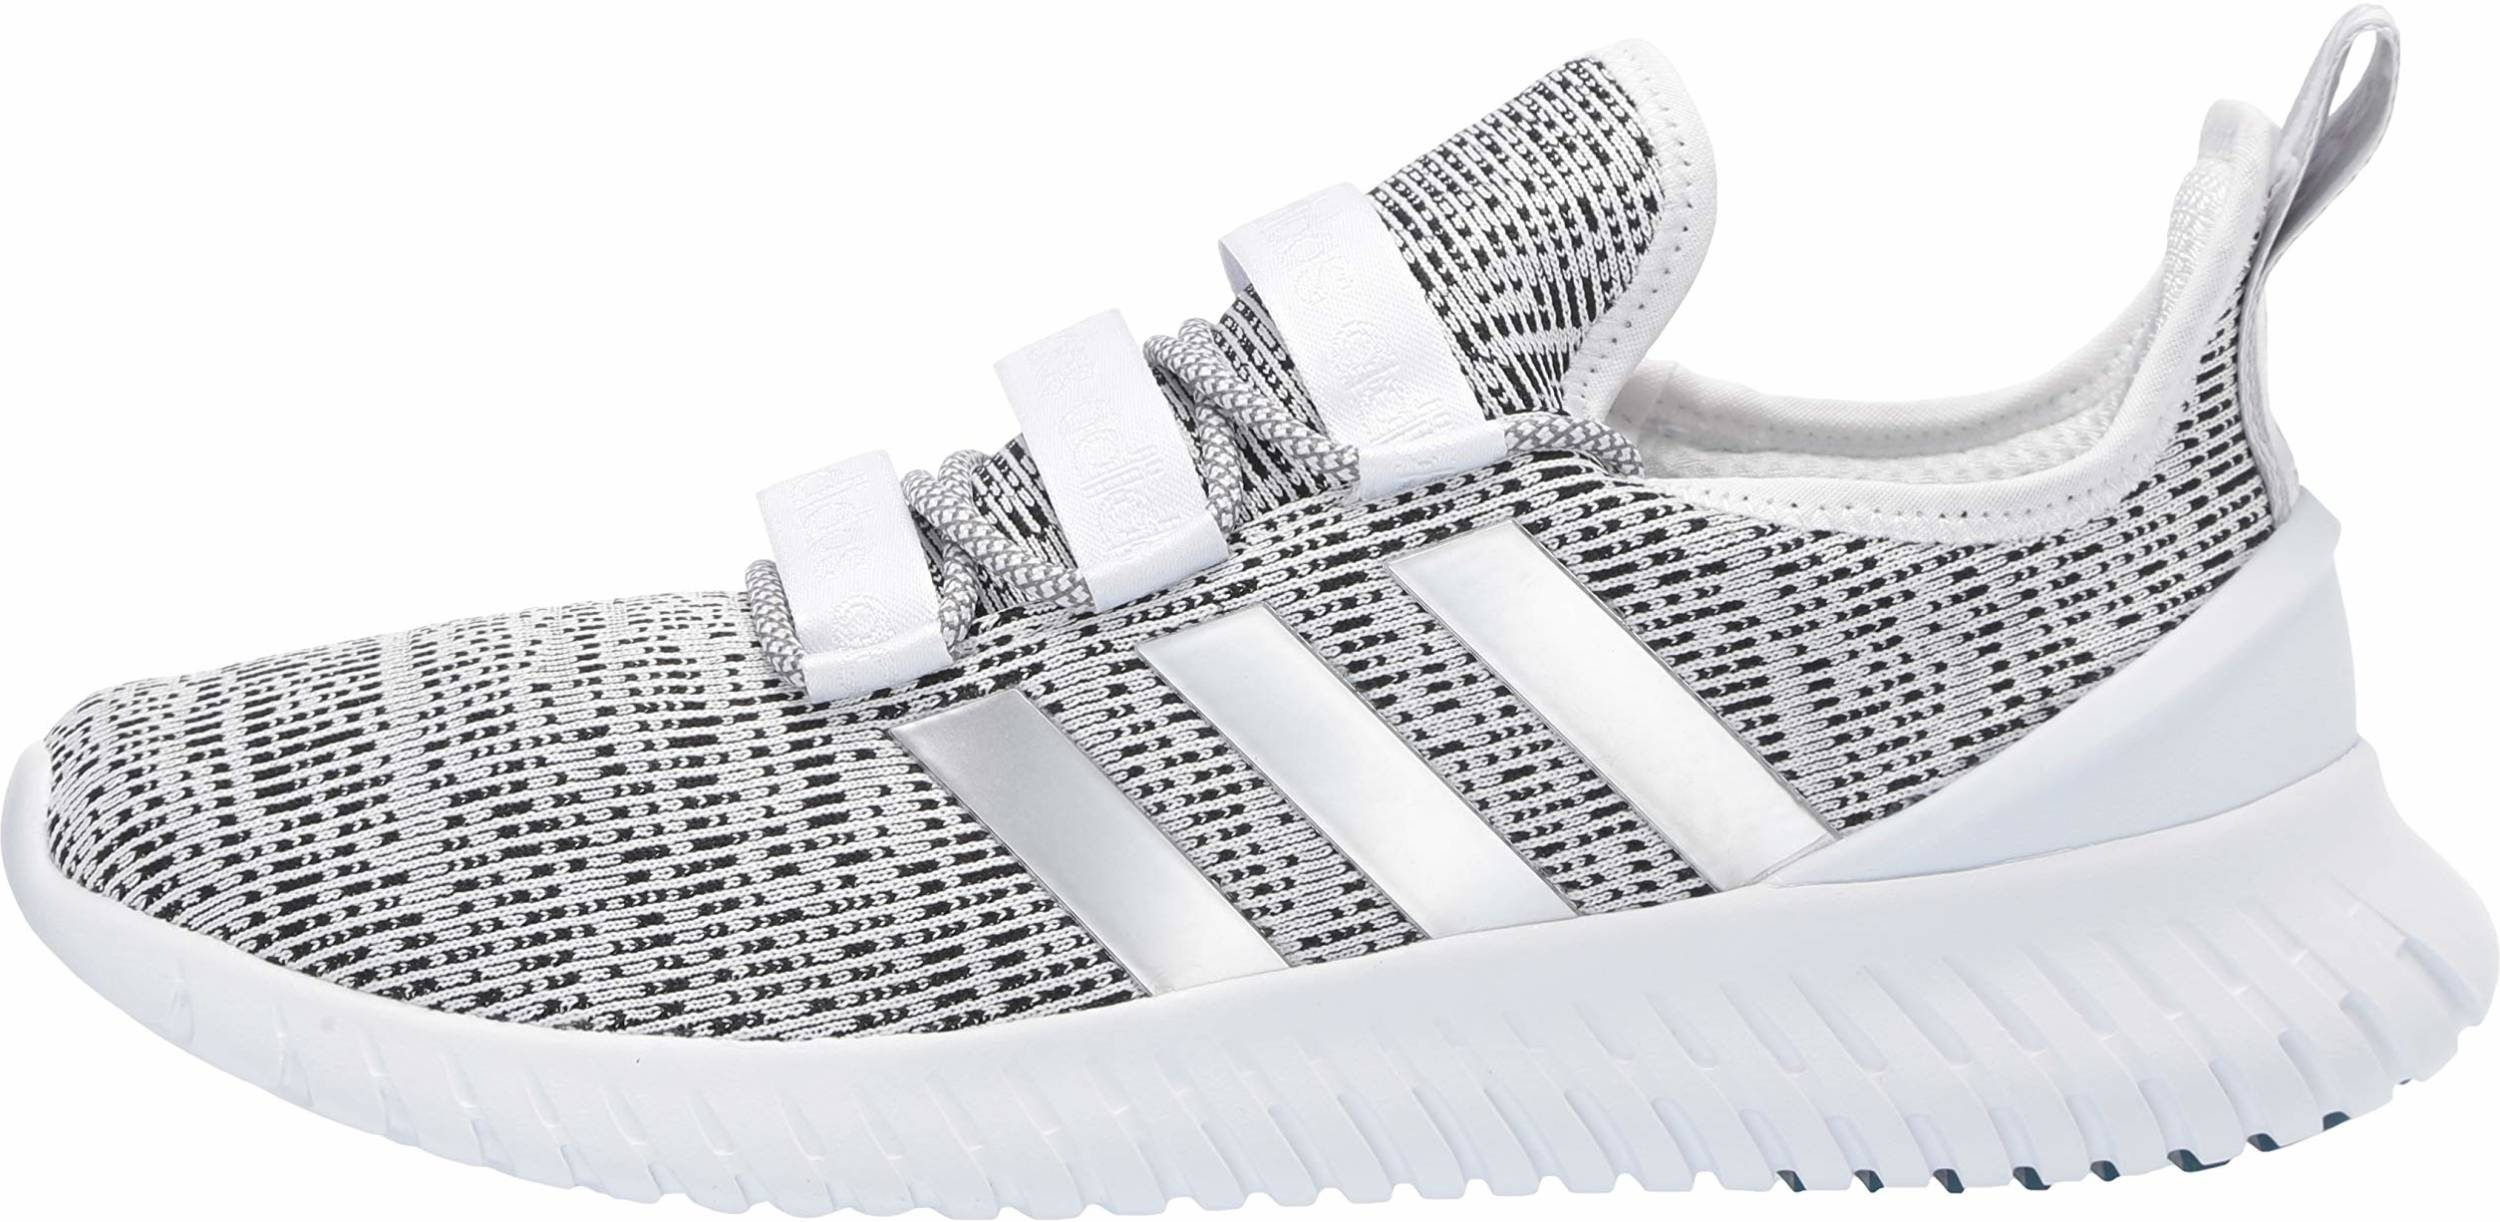 40 Adidas NEO sneakers - Save 49%   RunRepeat